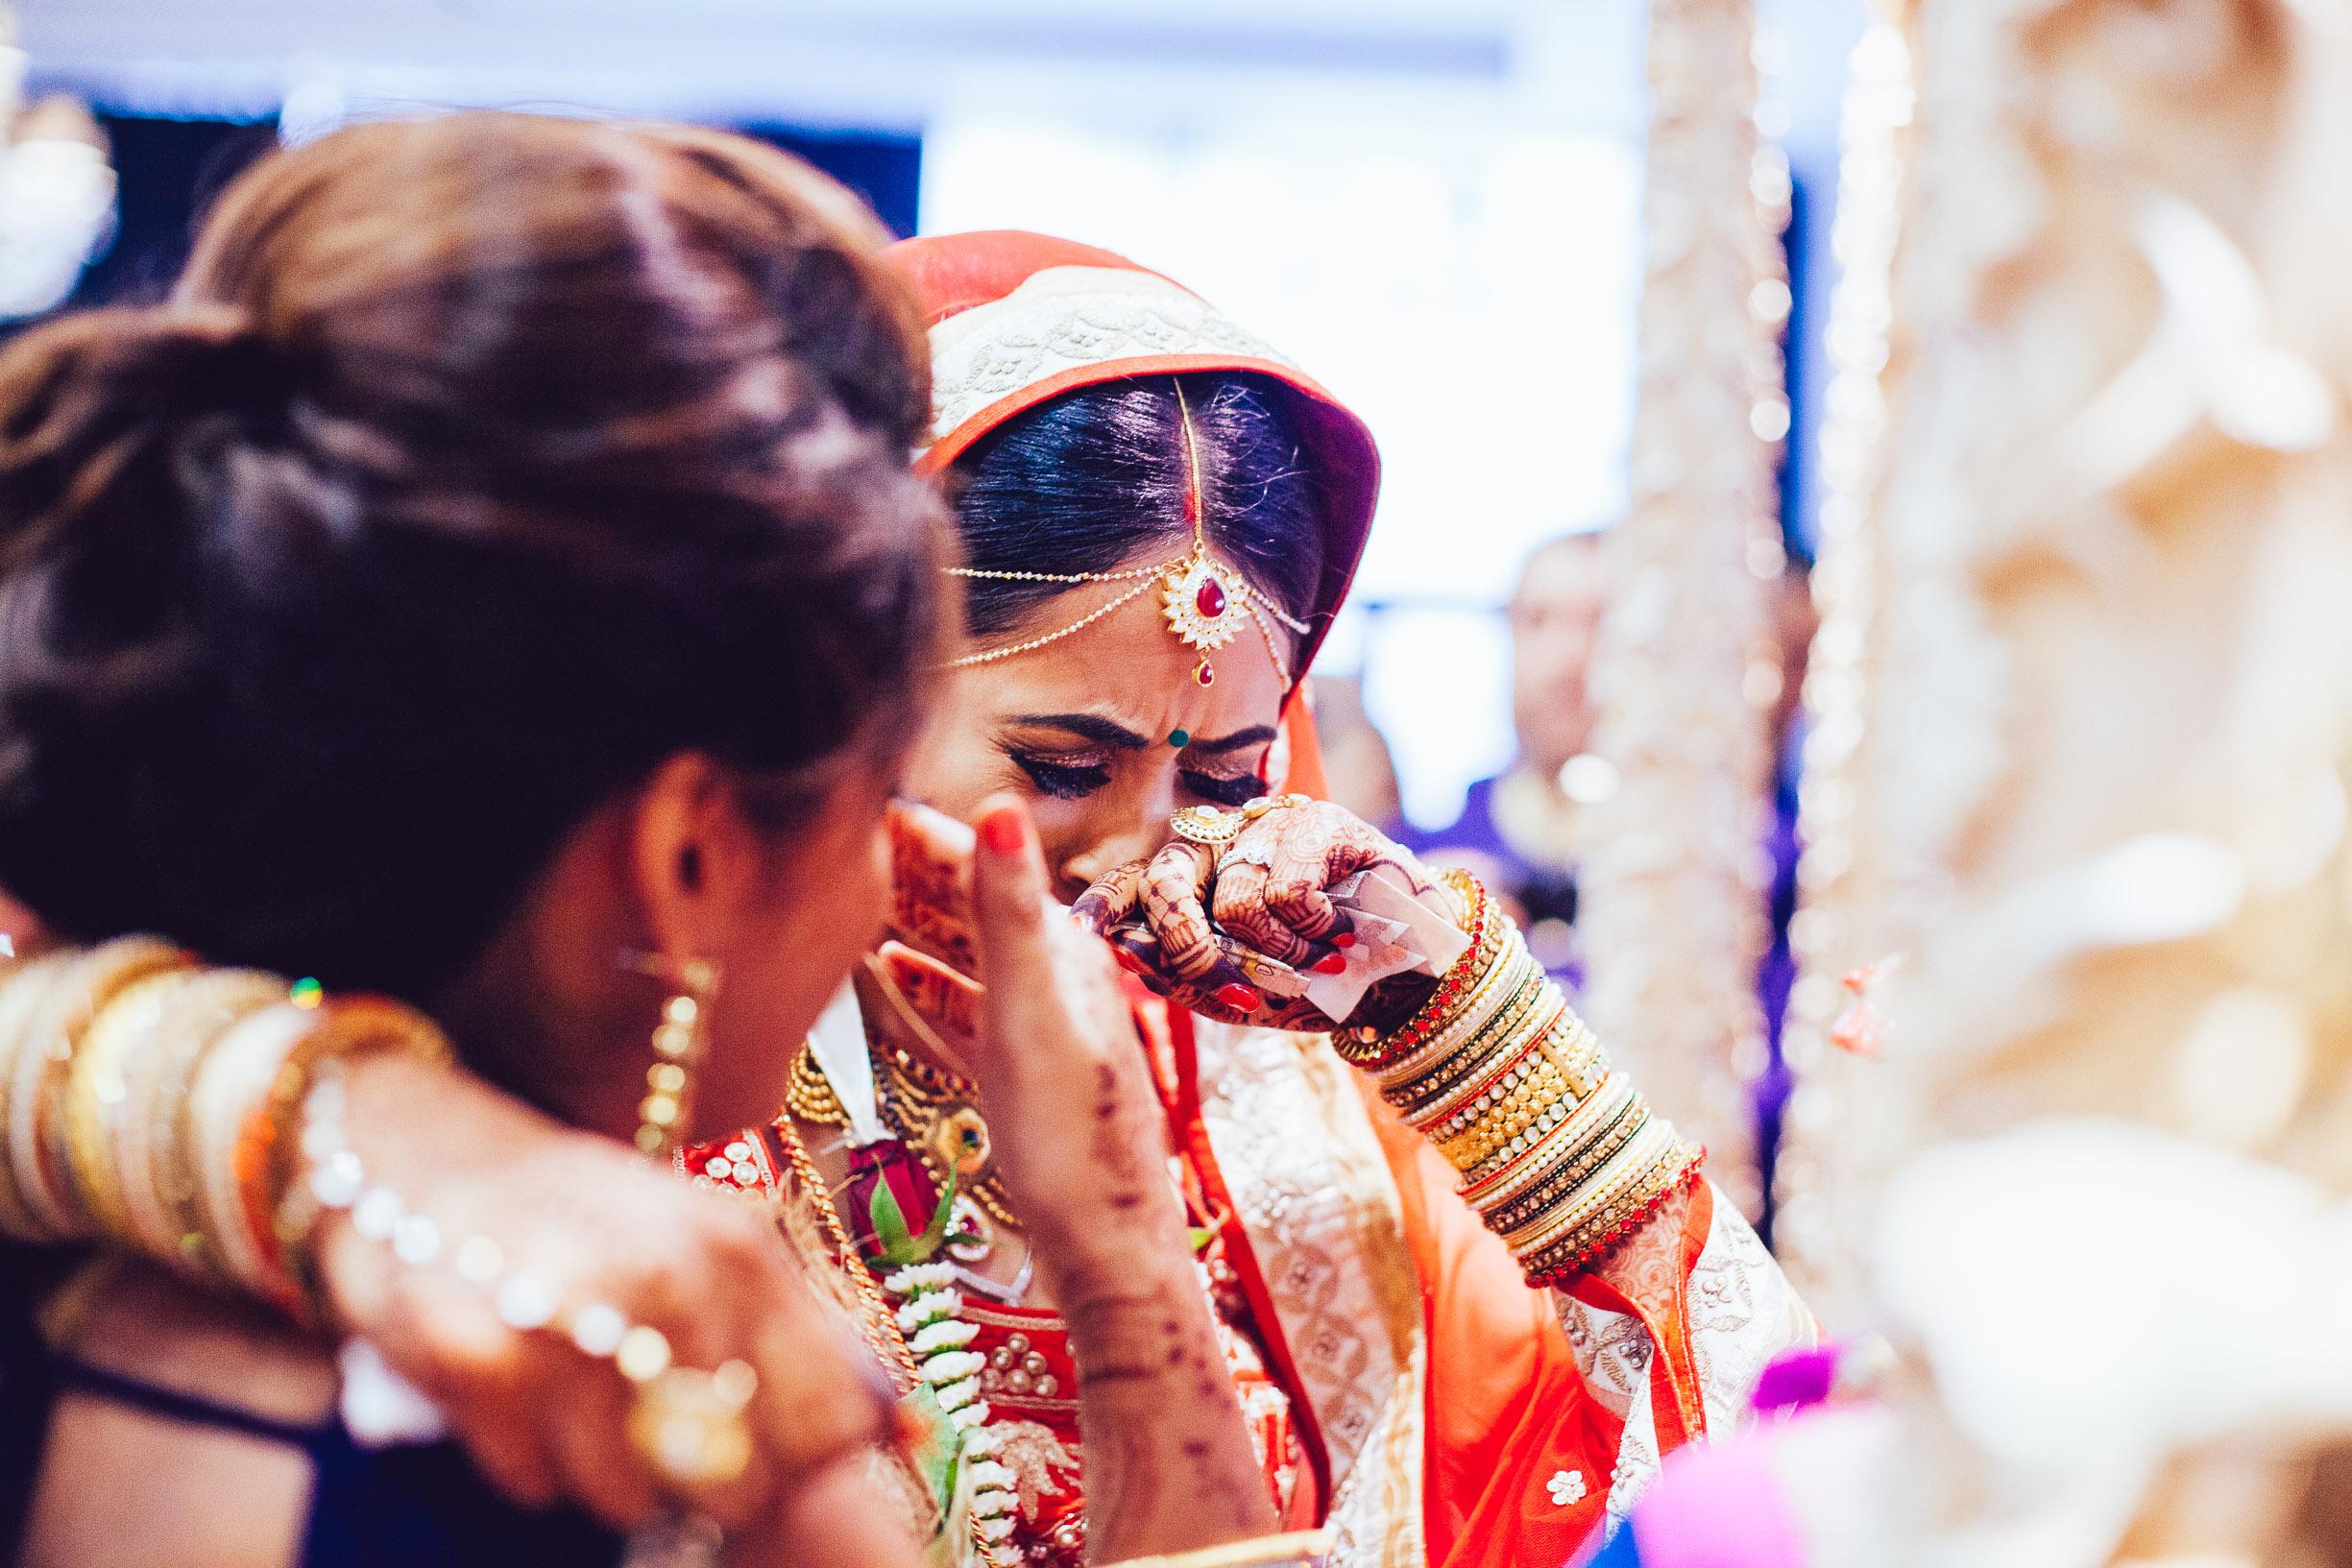 amit&ceema_eden_moments_wedding_photography-22